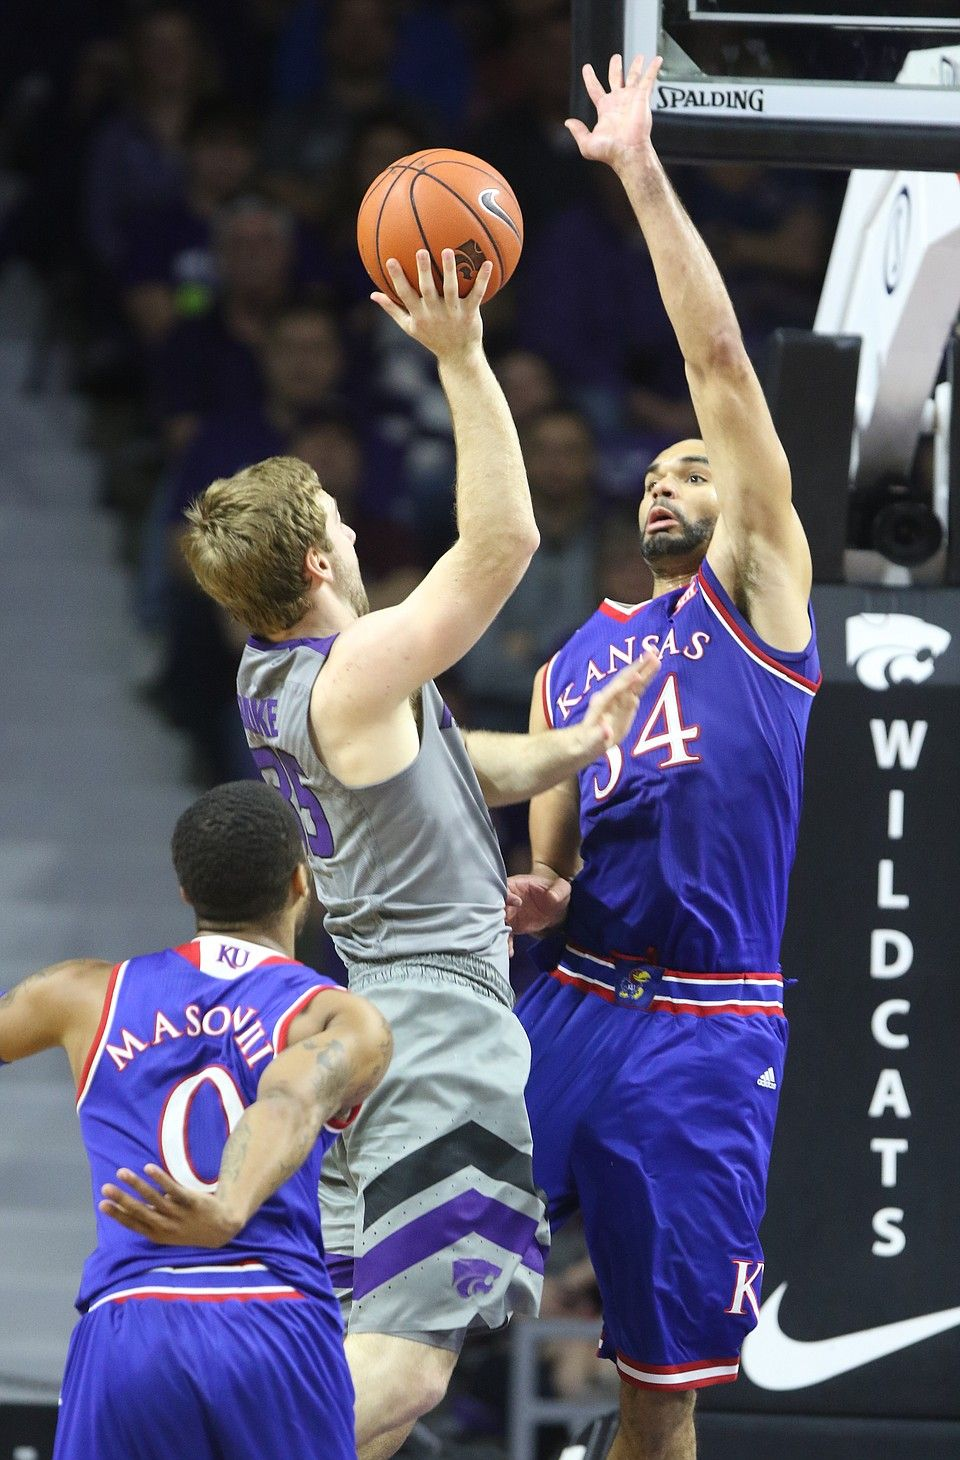 photo thumbnail Kansas basketball, Kansas state, Kansas